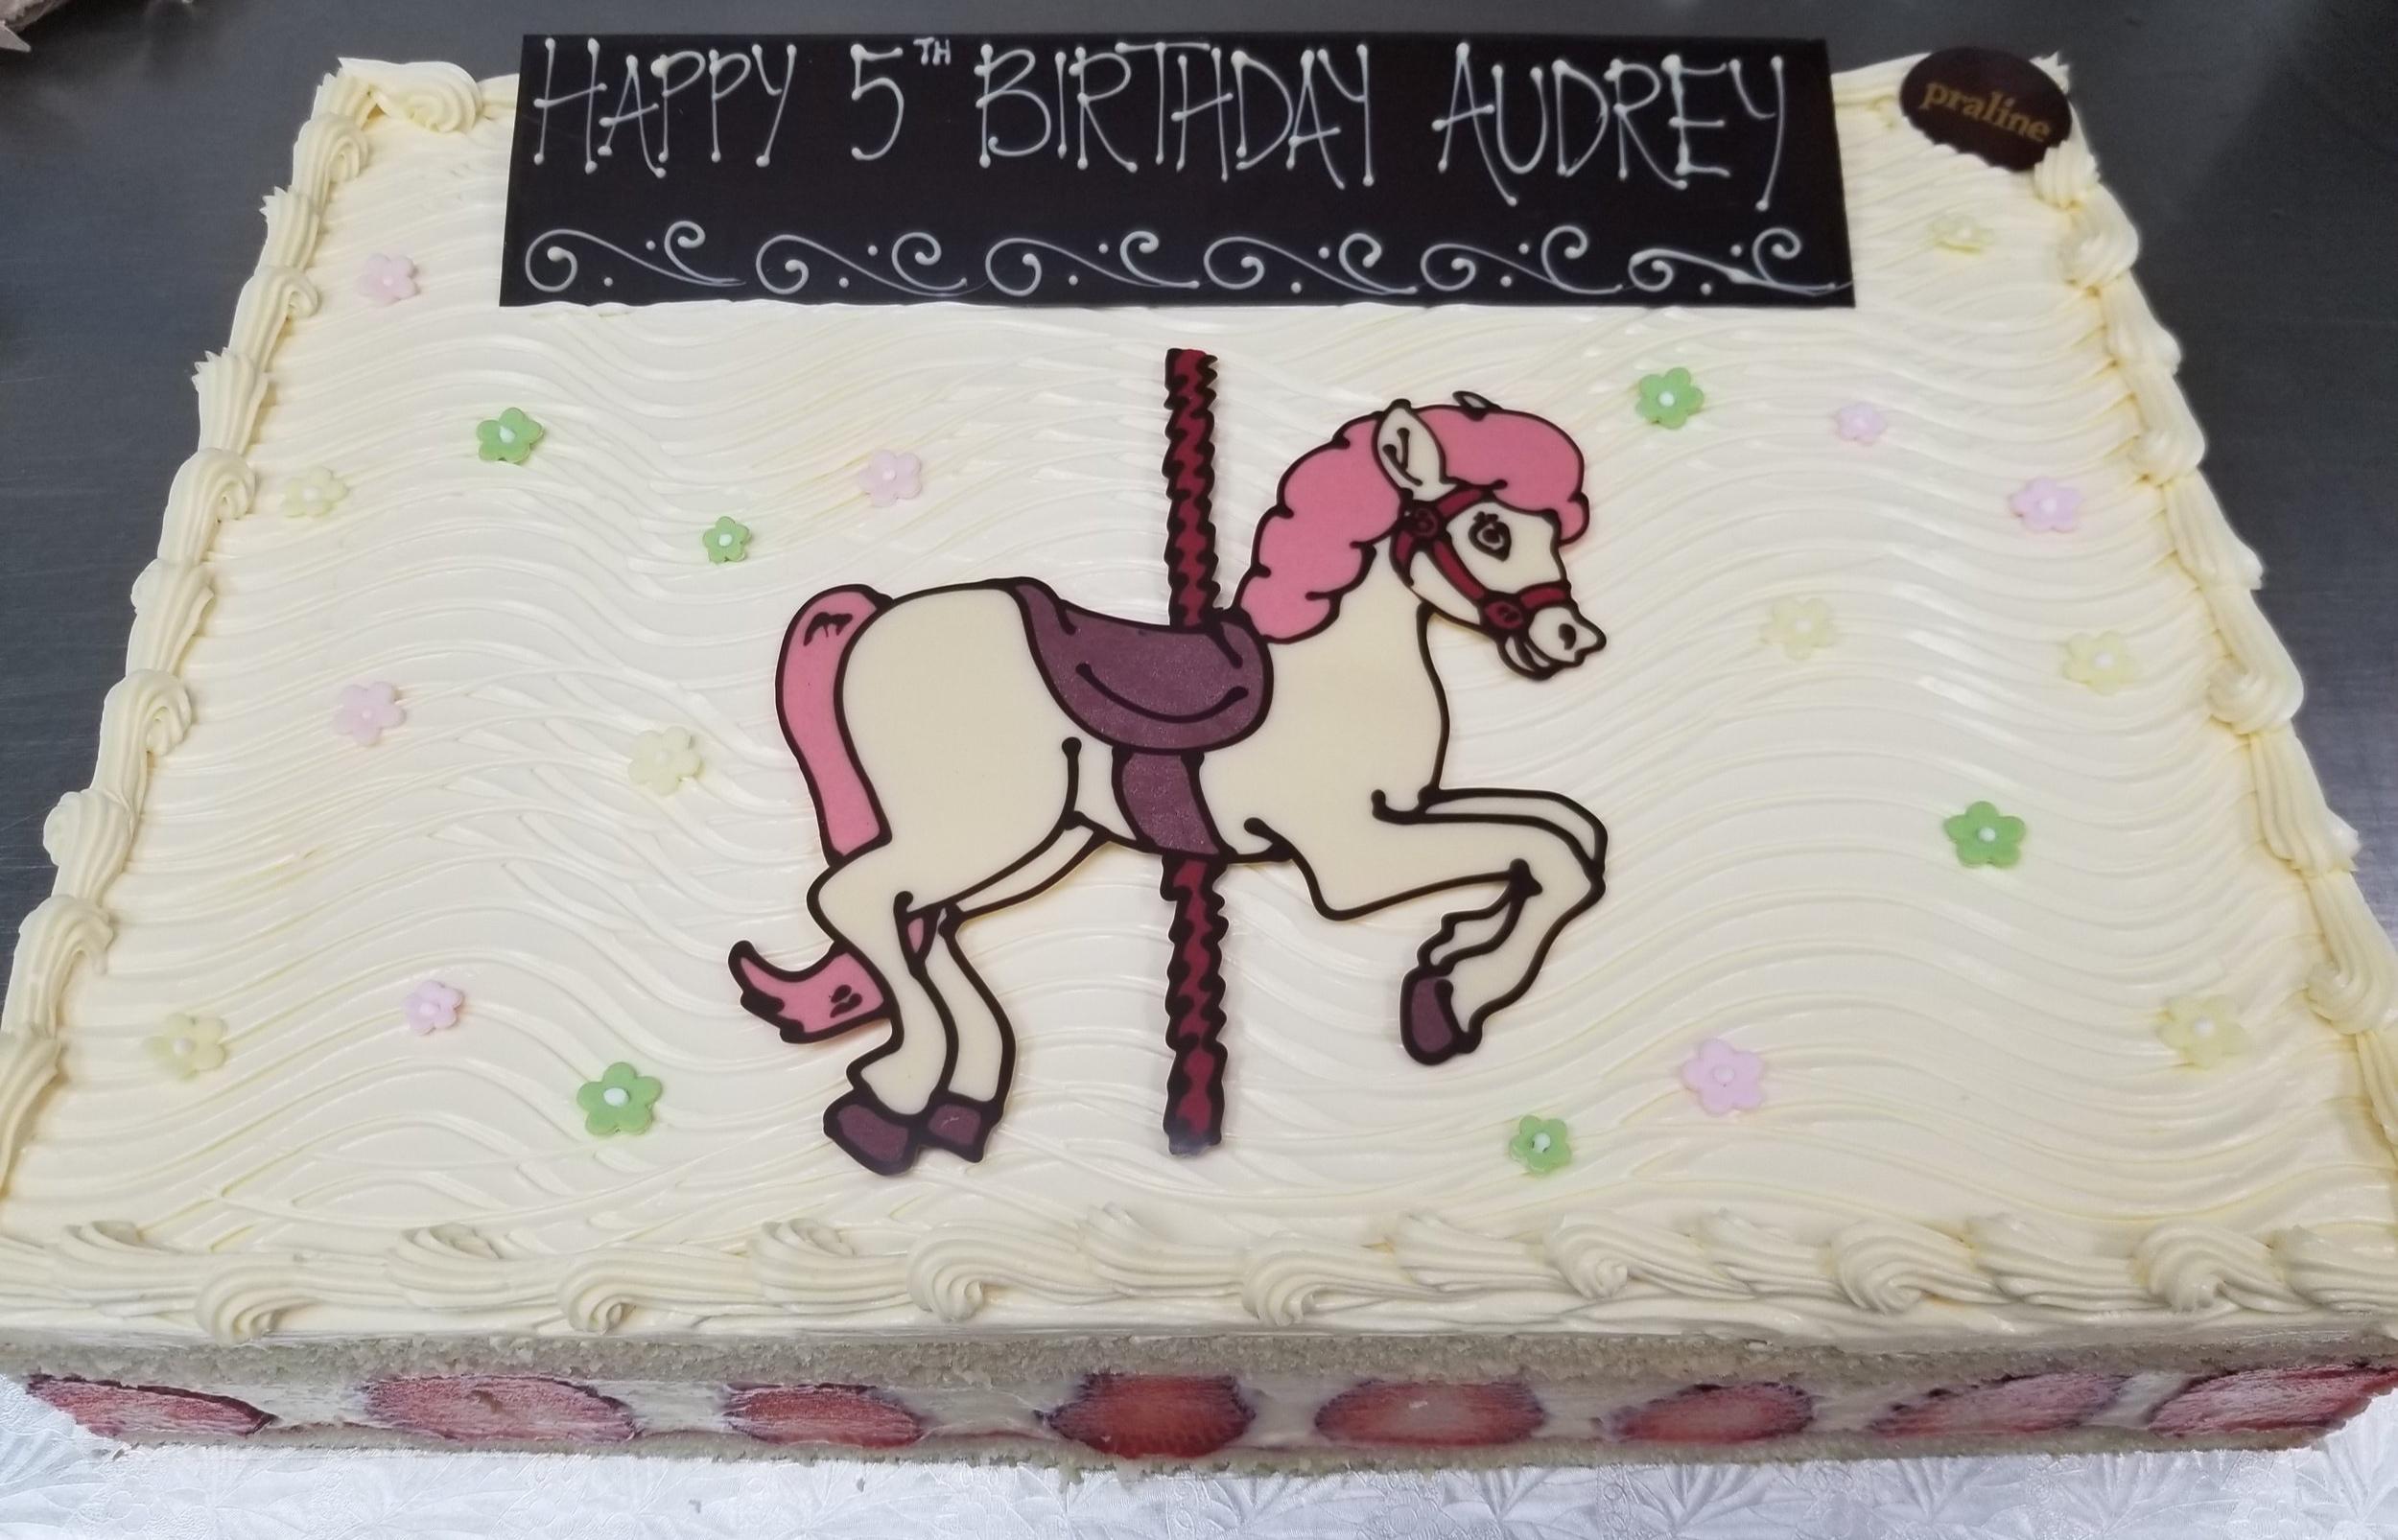 bday cake caroussel.jpg